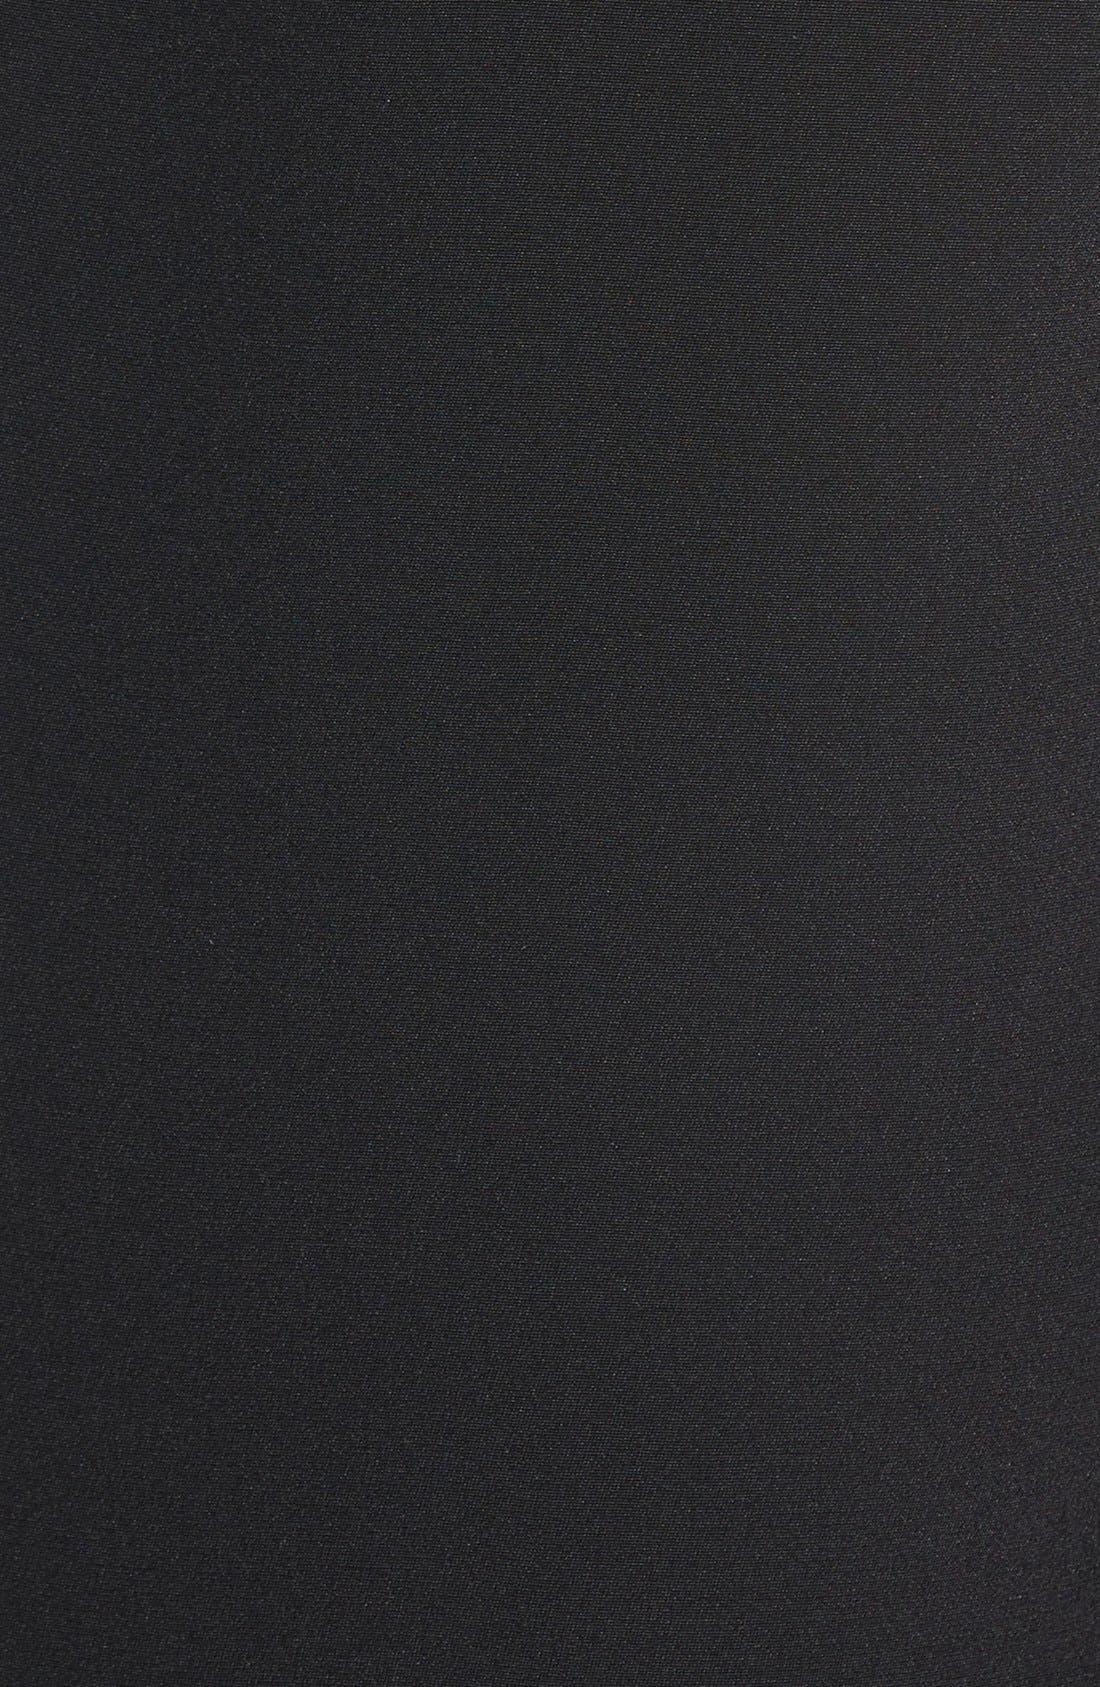 REBECCA MINKOFF, 'Becky' Long Tuxedo Blazer, Alternate thumbnail 3, color, 001